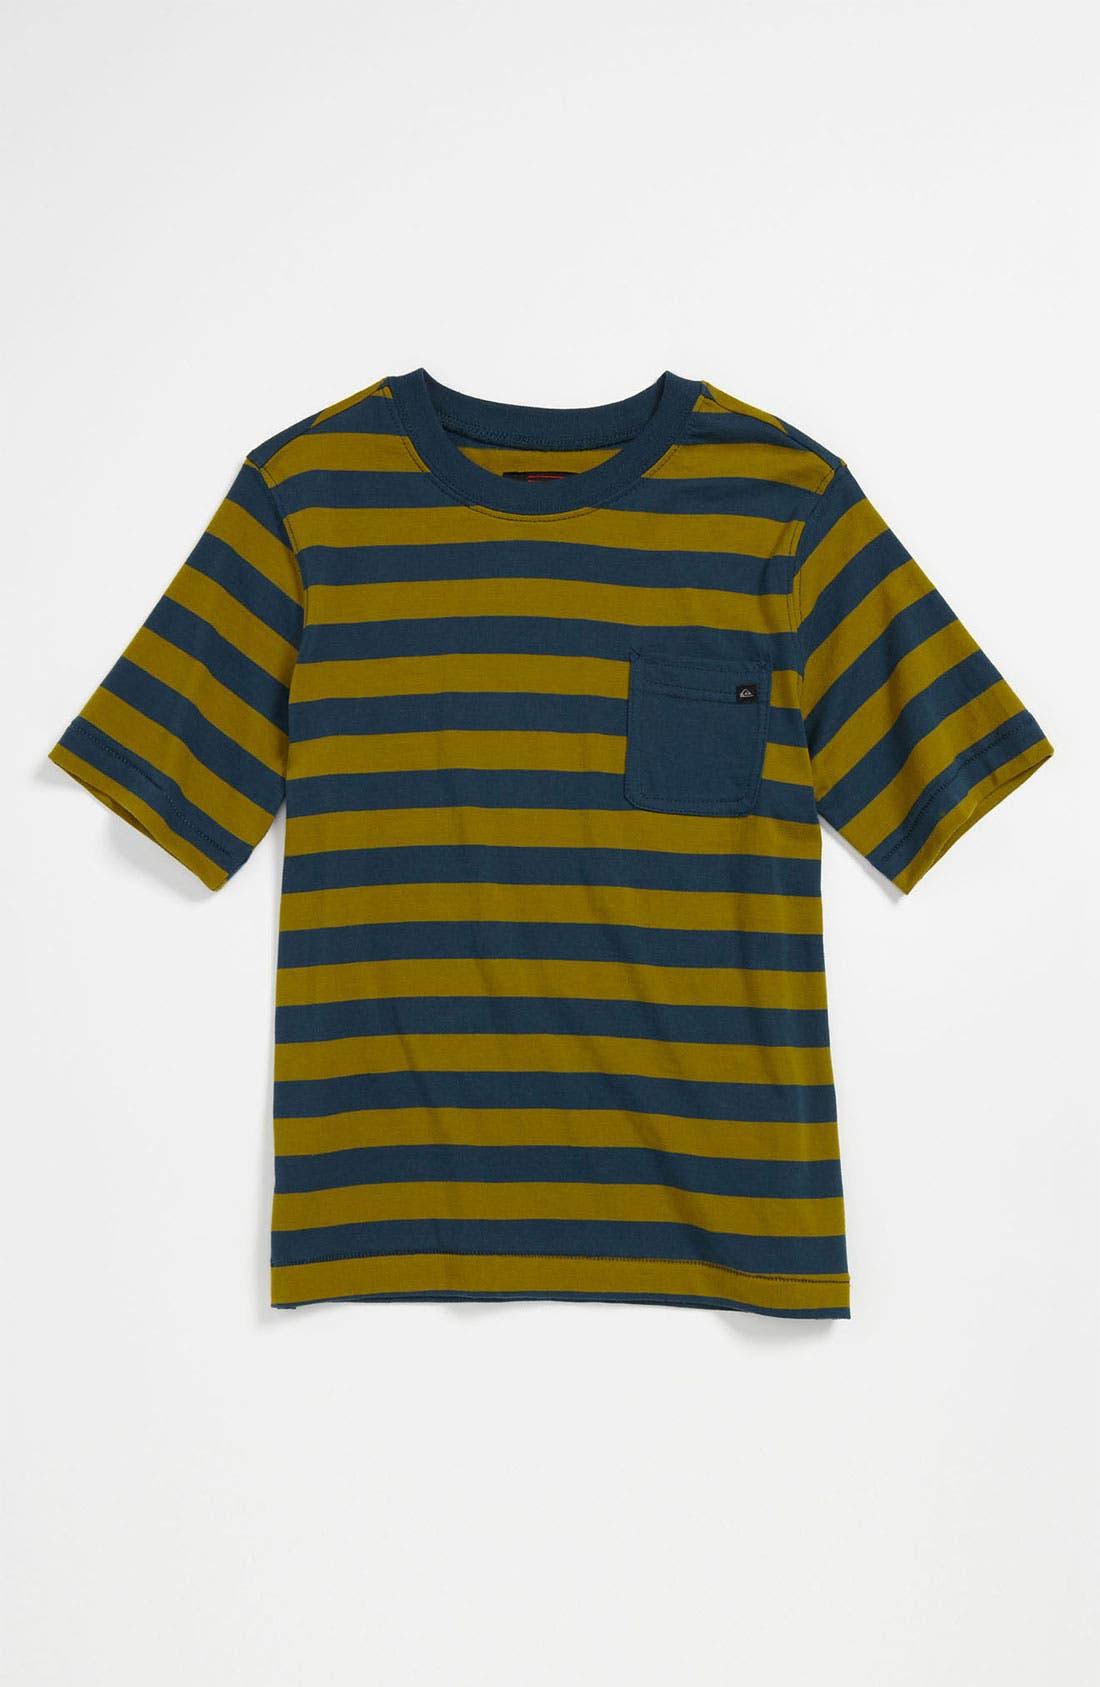 Alternate Image 1 Selected - Quiksilver 'Nolf' Crewneck T-Shirt (Little Boys)